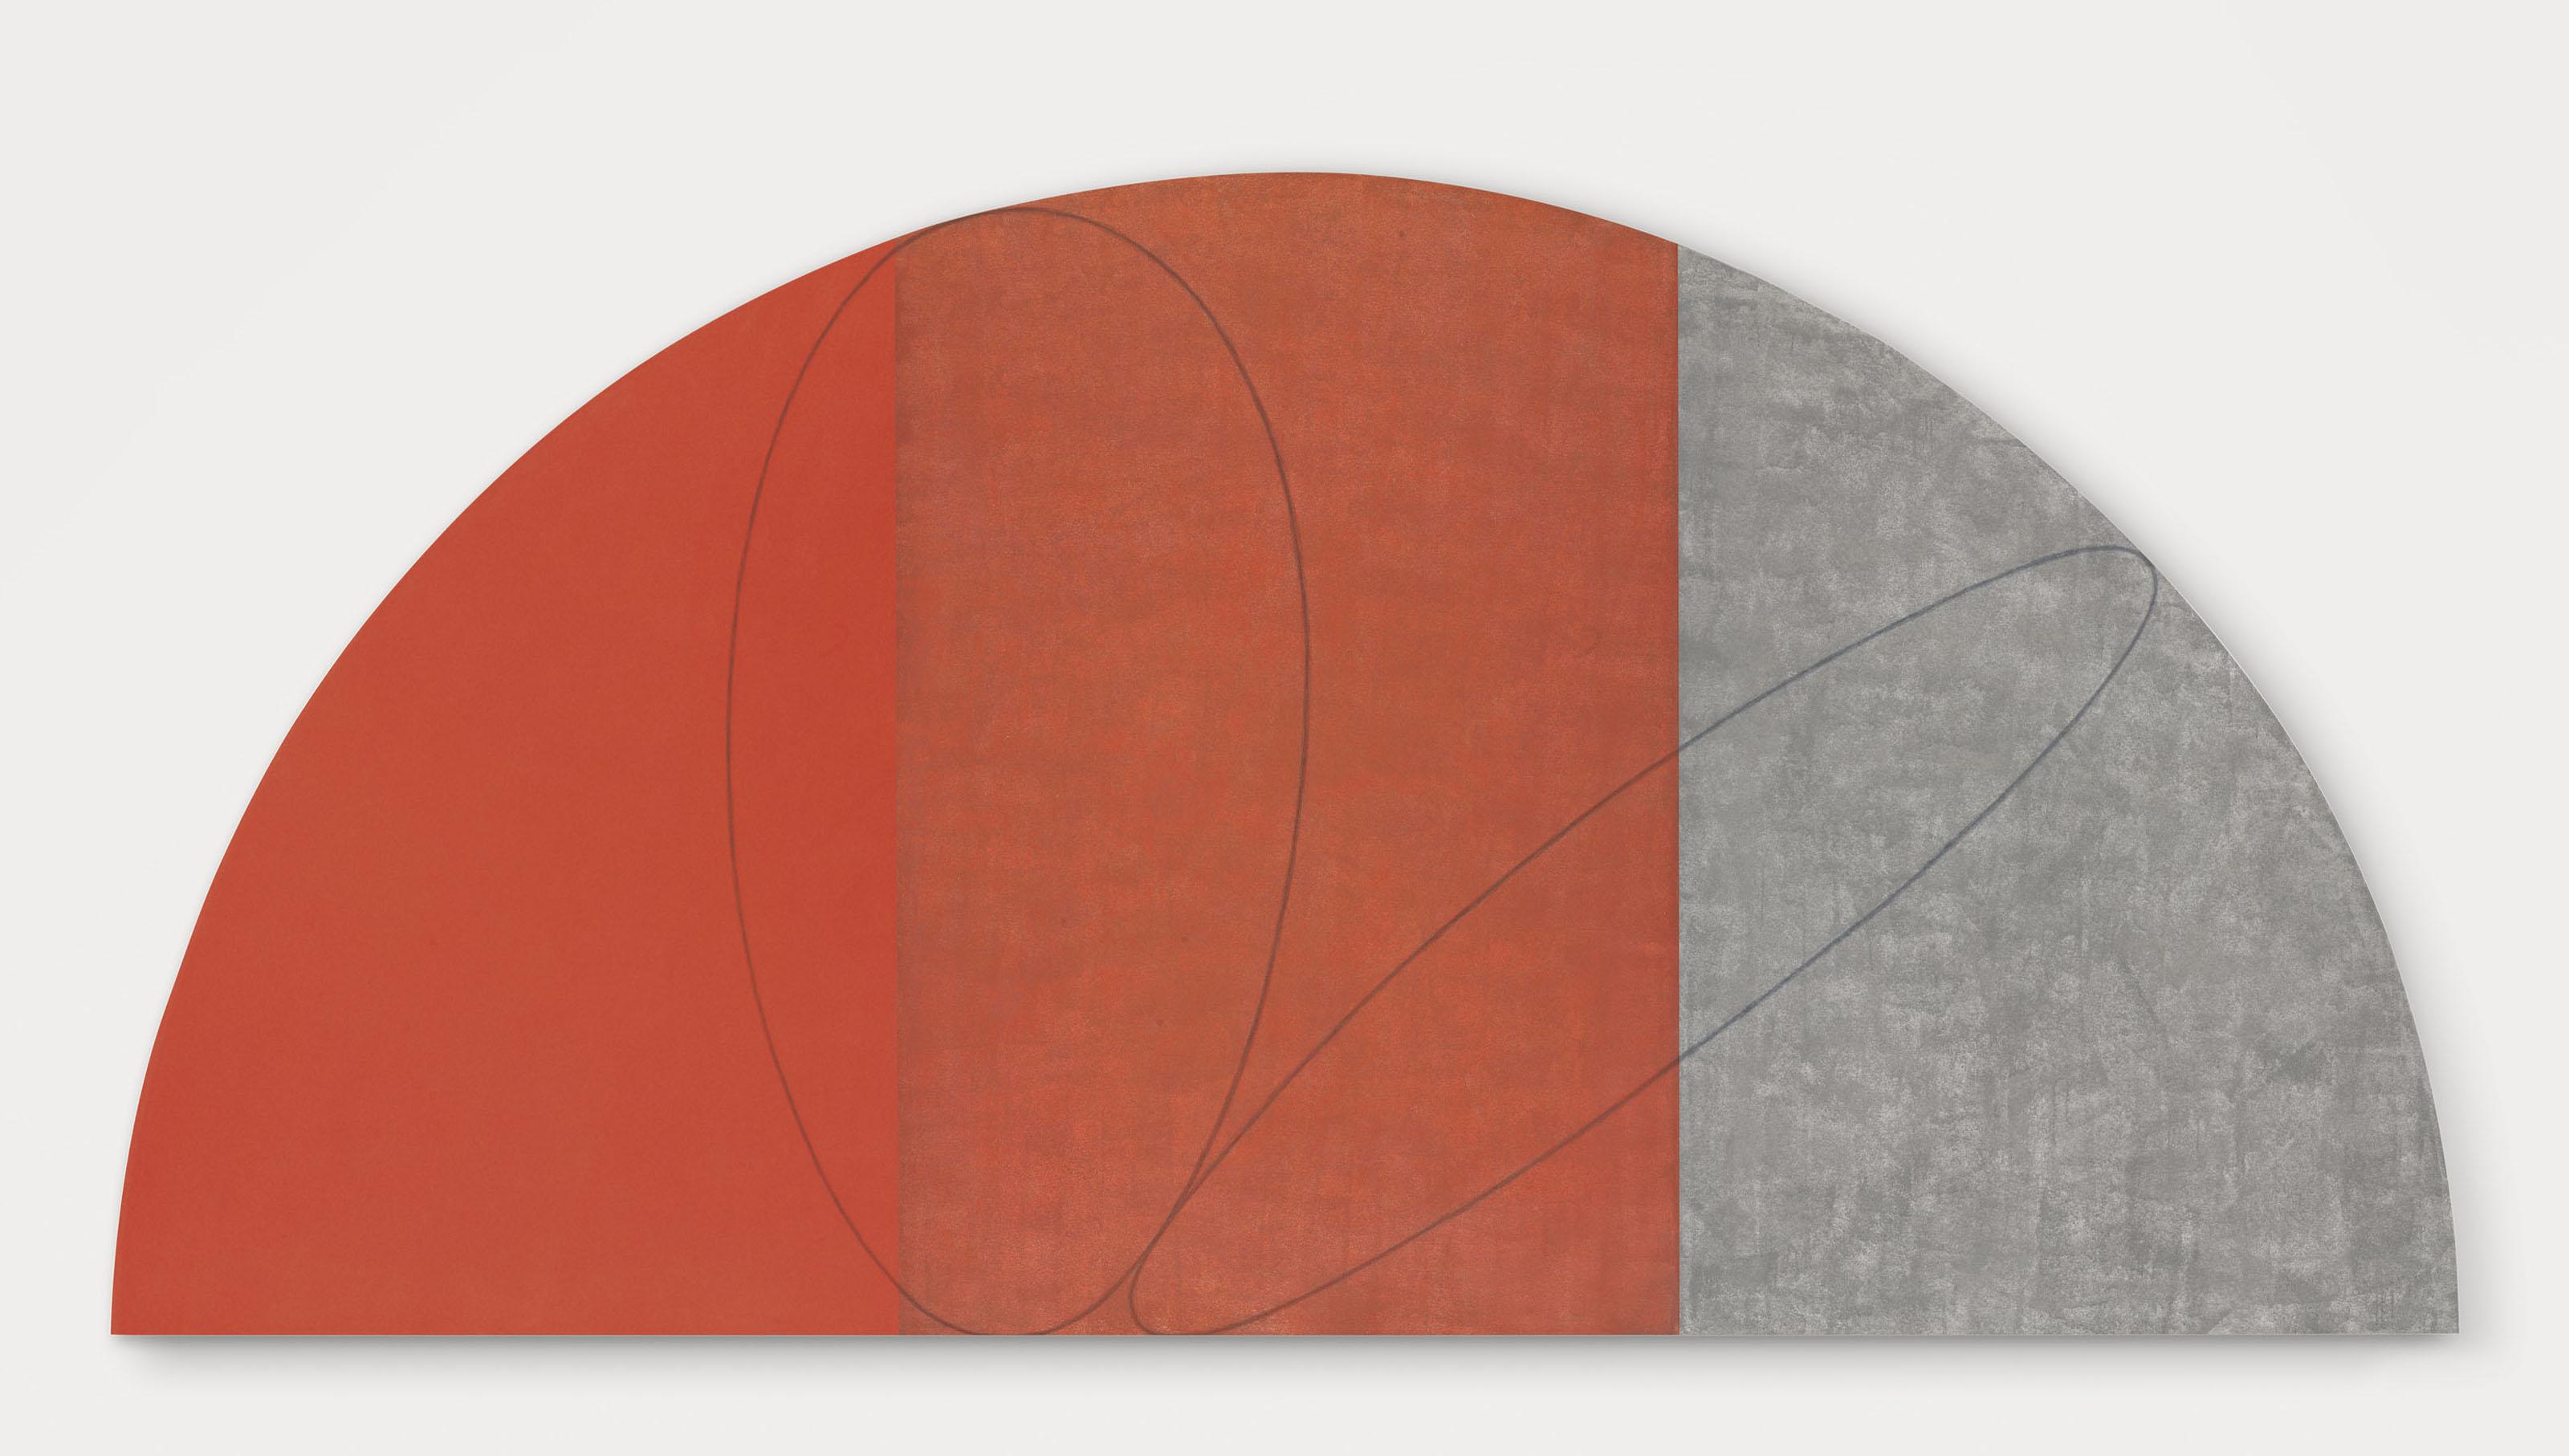 Curved Plane/Figure VII